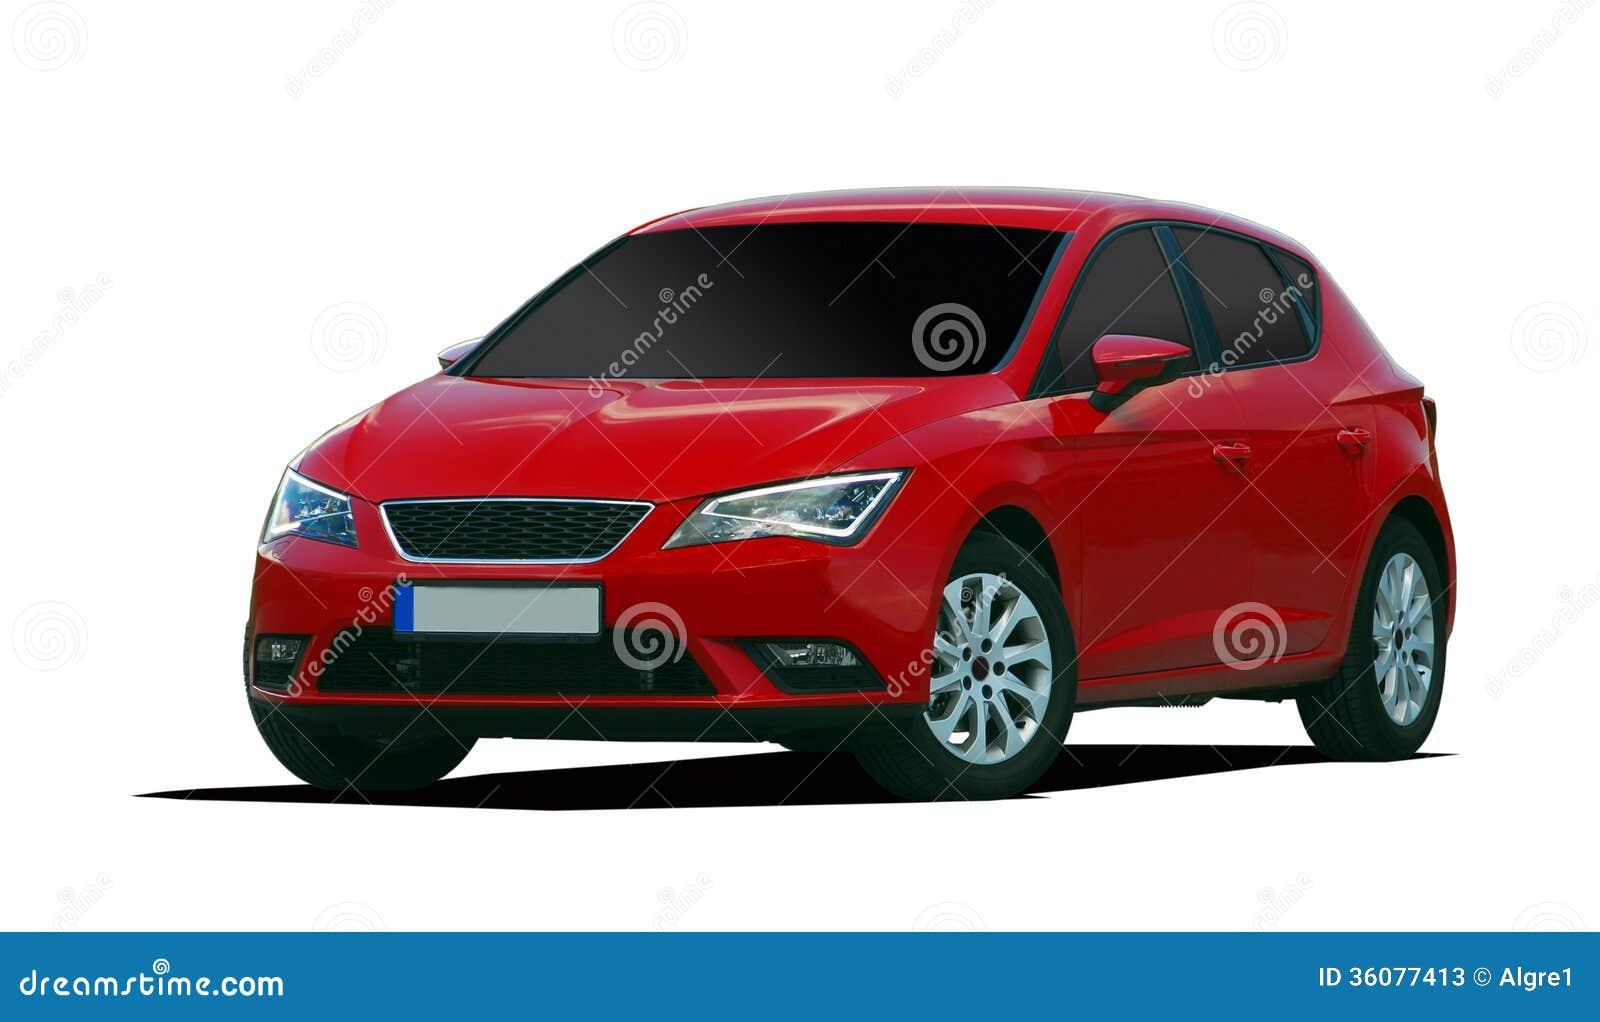 Red Passenger Car Stock Photos - Image: 36077413